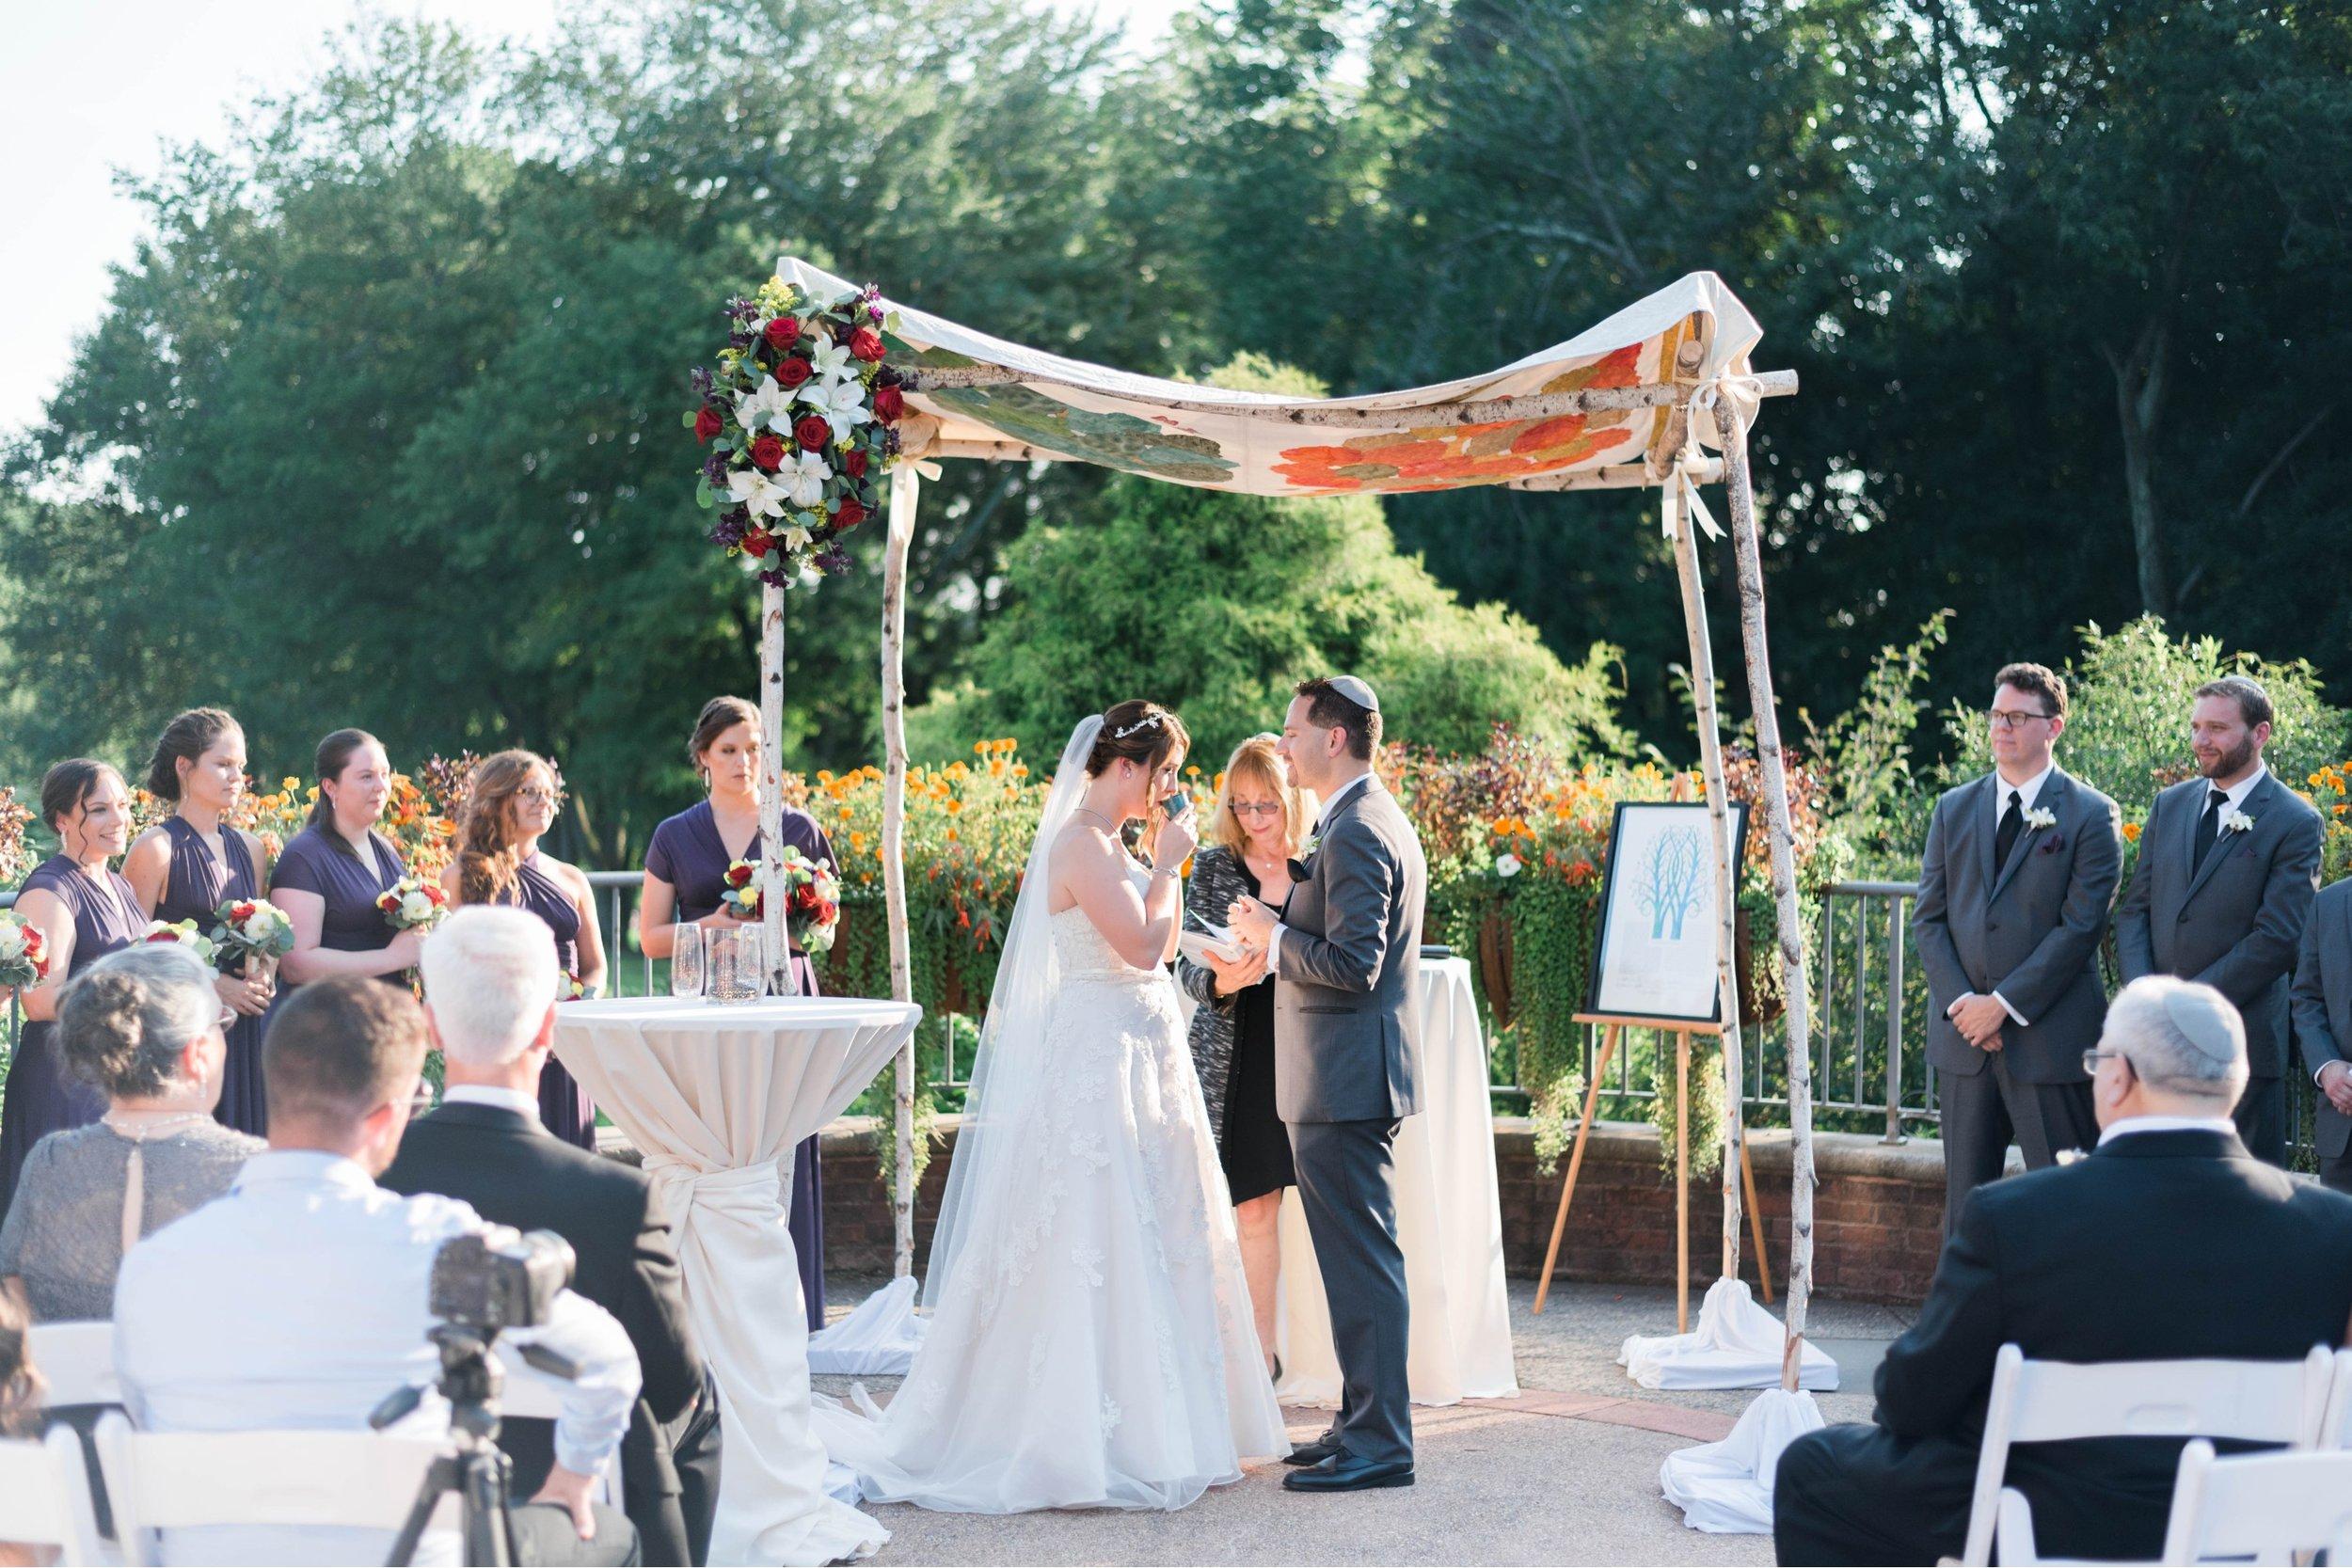 TheAtriumatMeadowlark_Virginiawedding photographer_lynchburgweddingphotographer_DCweddingPhotographer_KristinAaron 28.jpg